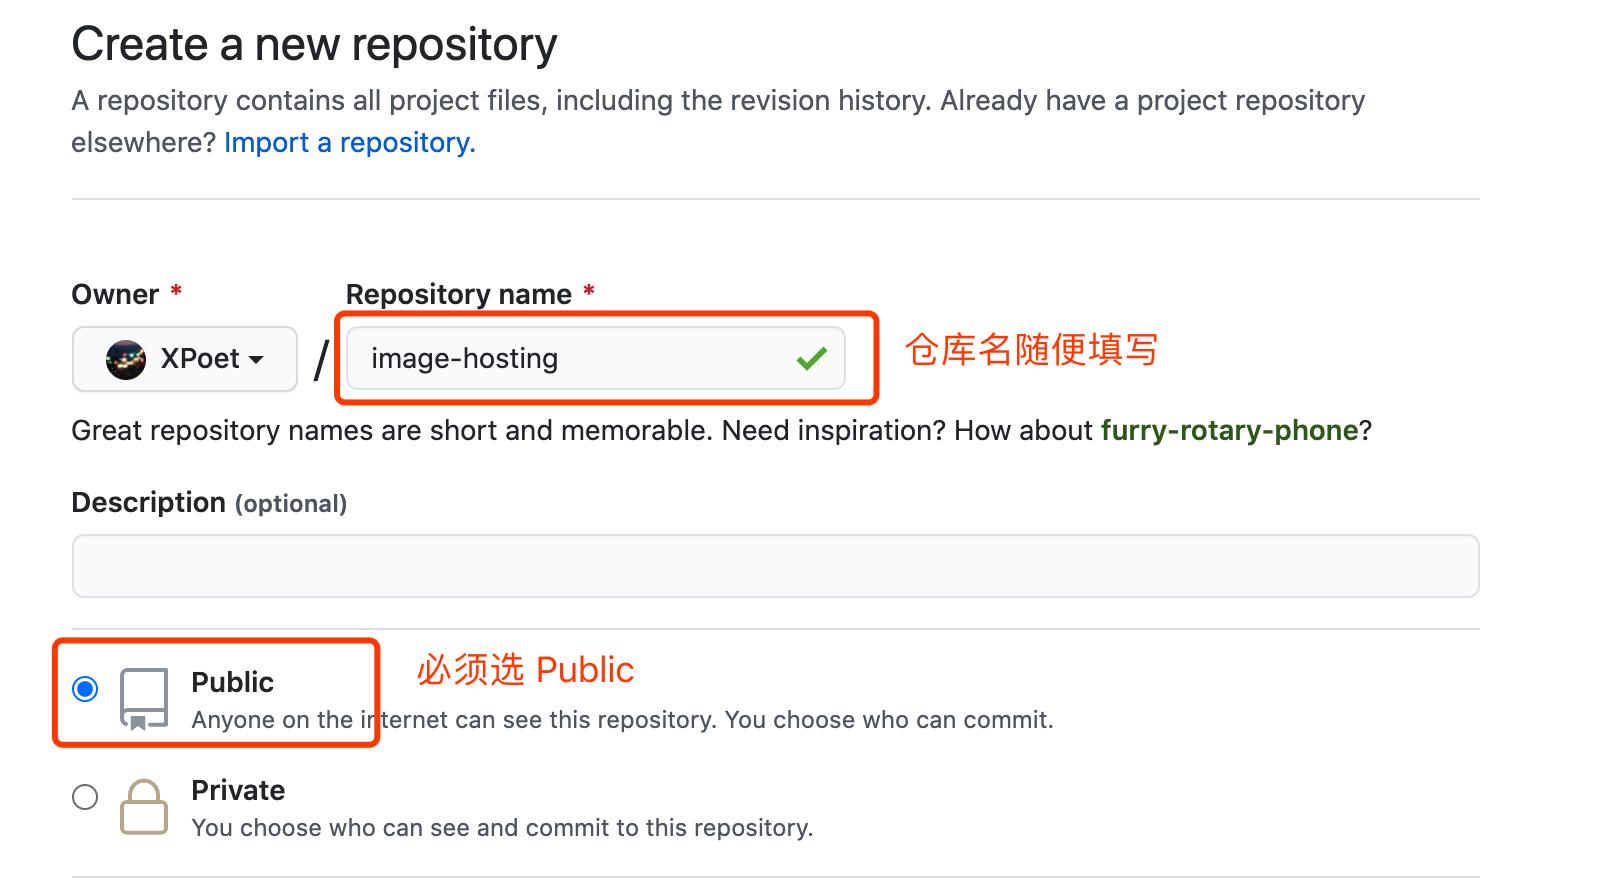 PicX:基于 GitHub API 开发的图床神器,图片外链使用 jsDelivr 进行 CDN 加速。